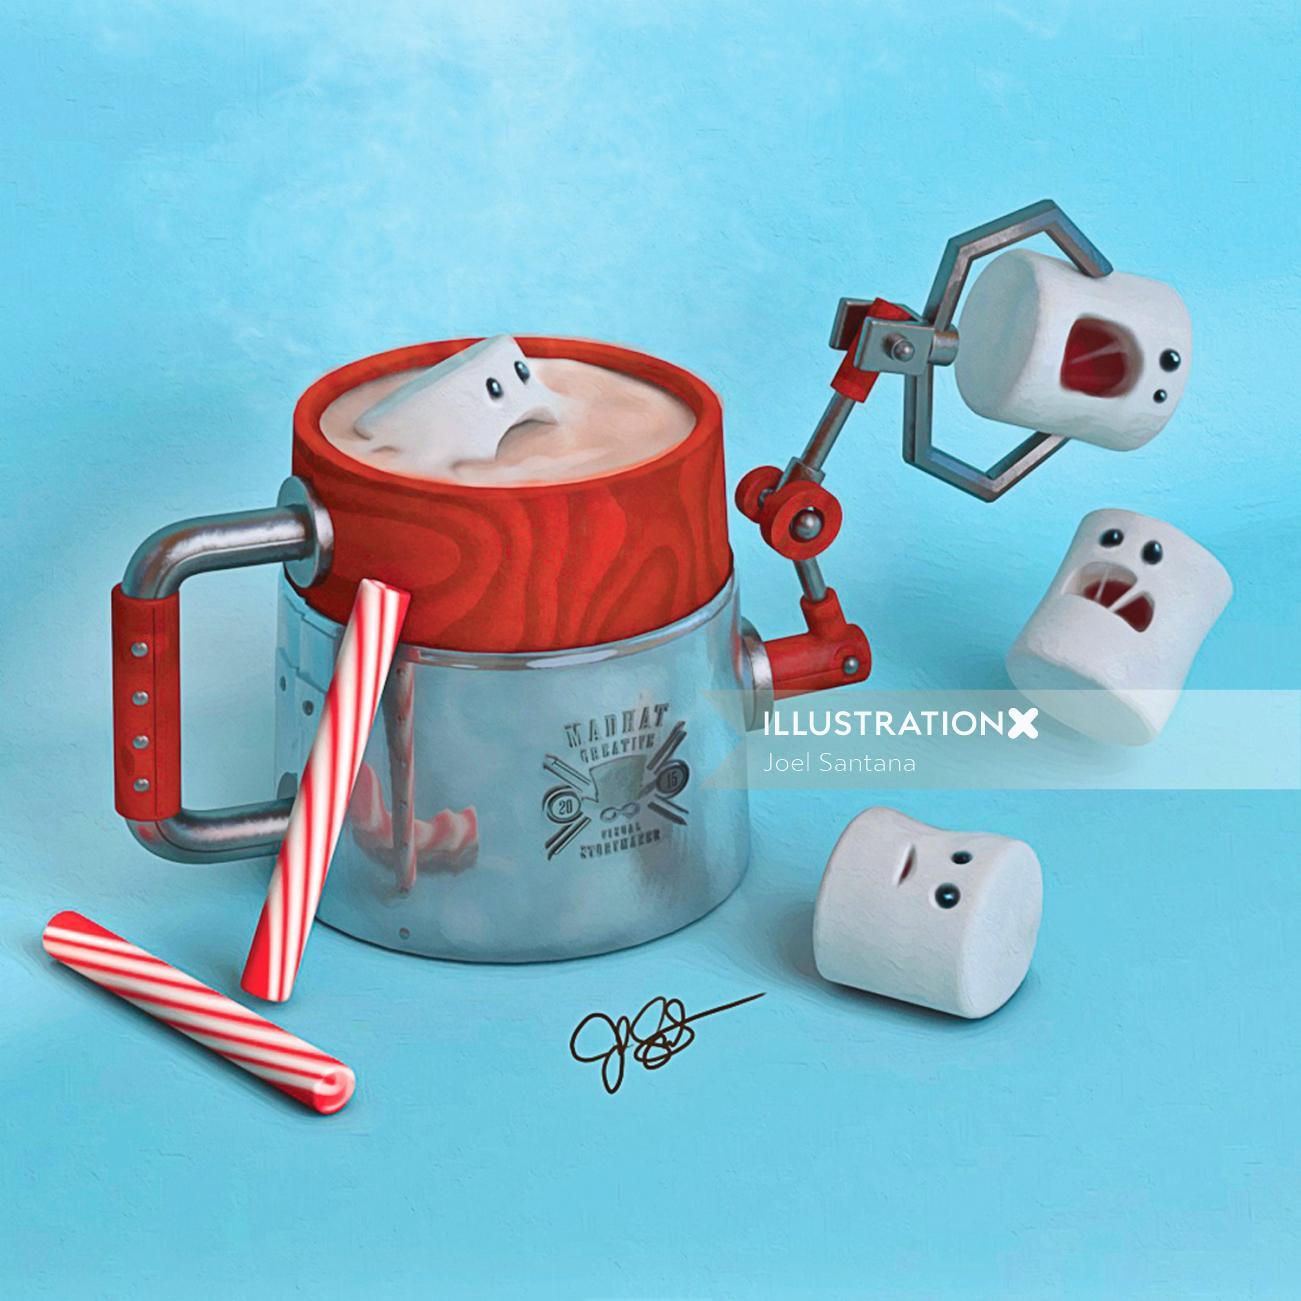 Graphic design of Hot coco machine